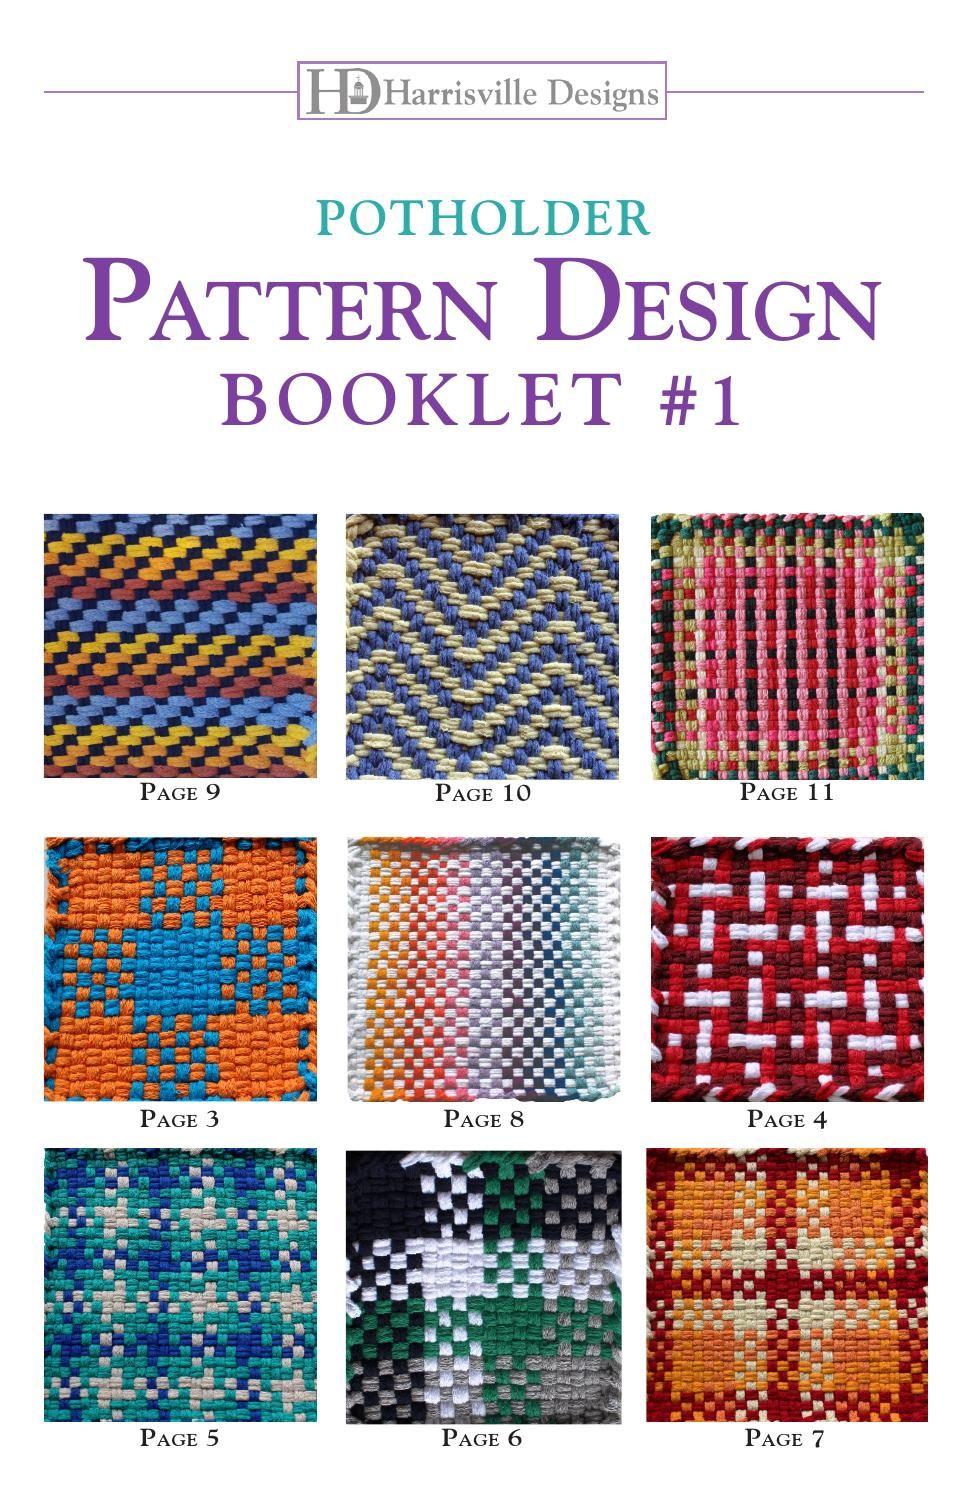 Potholder Pattern Booklet #1 | Telar, Tejido y Bordado